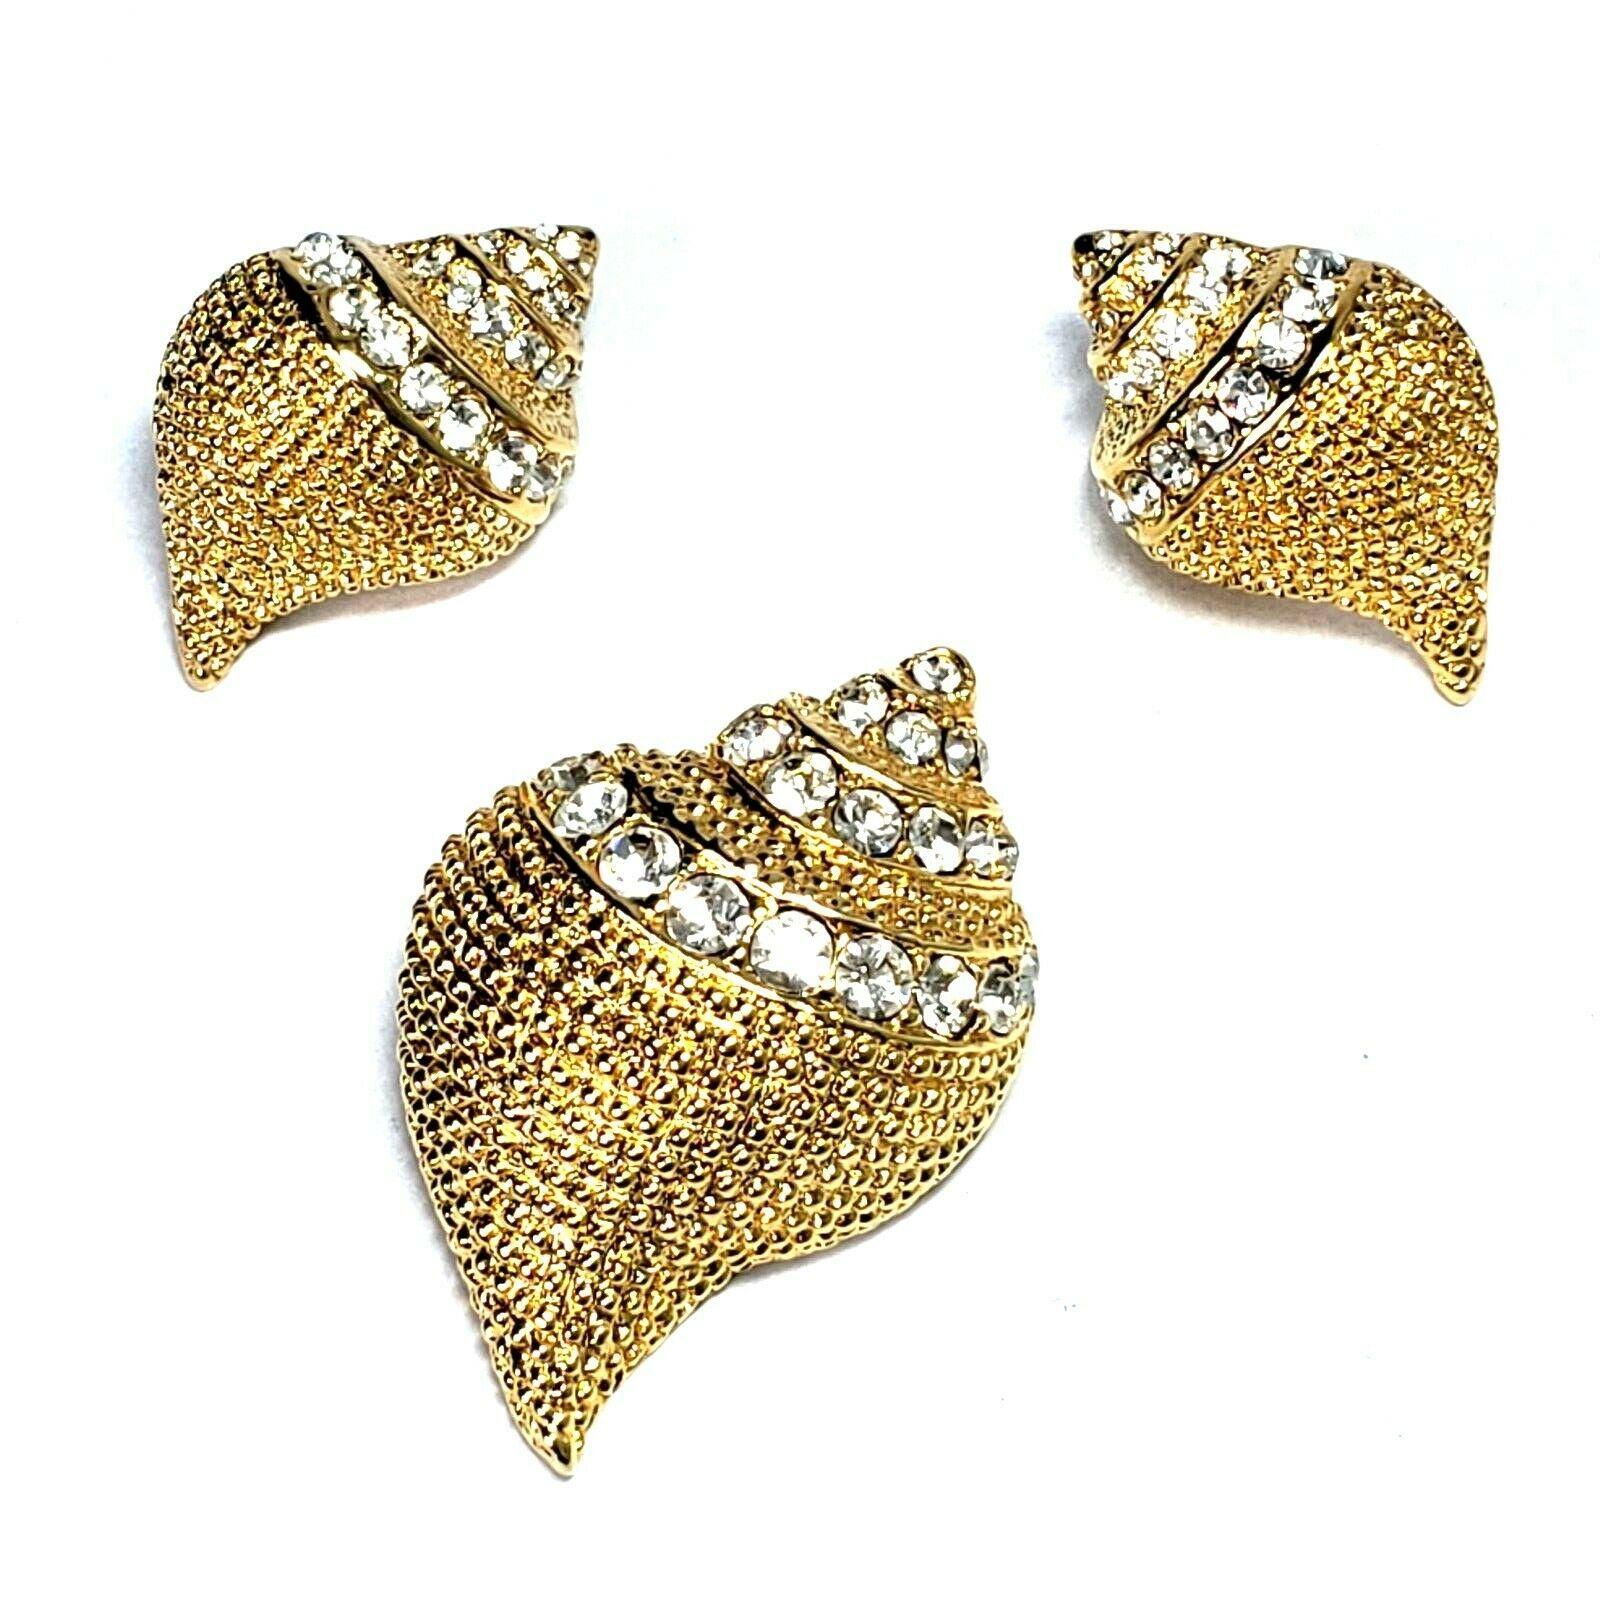 Vintage KJL Kenneth J Lane CONCH Shell Brooch Pin Pendant AND Post Earrings - $39.88